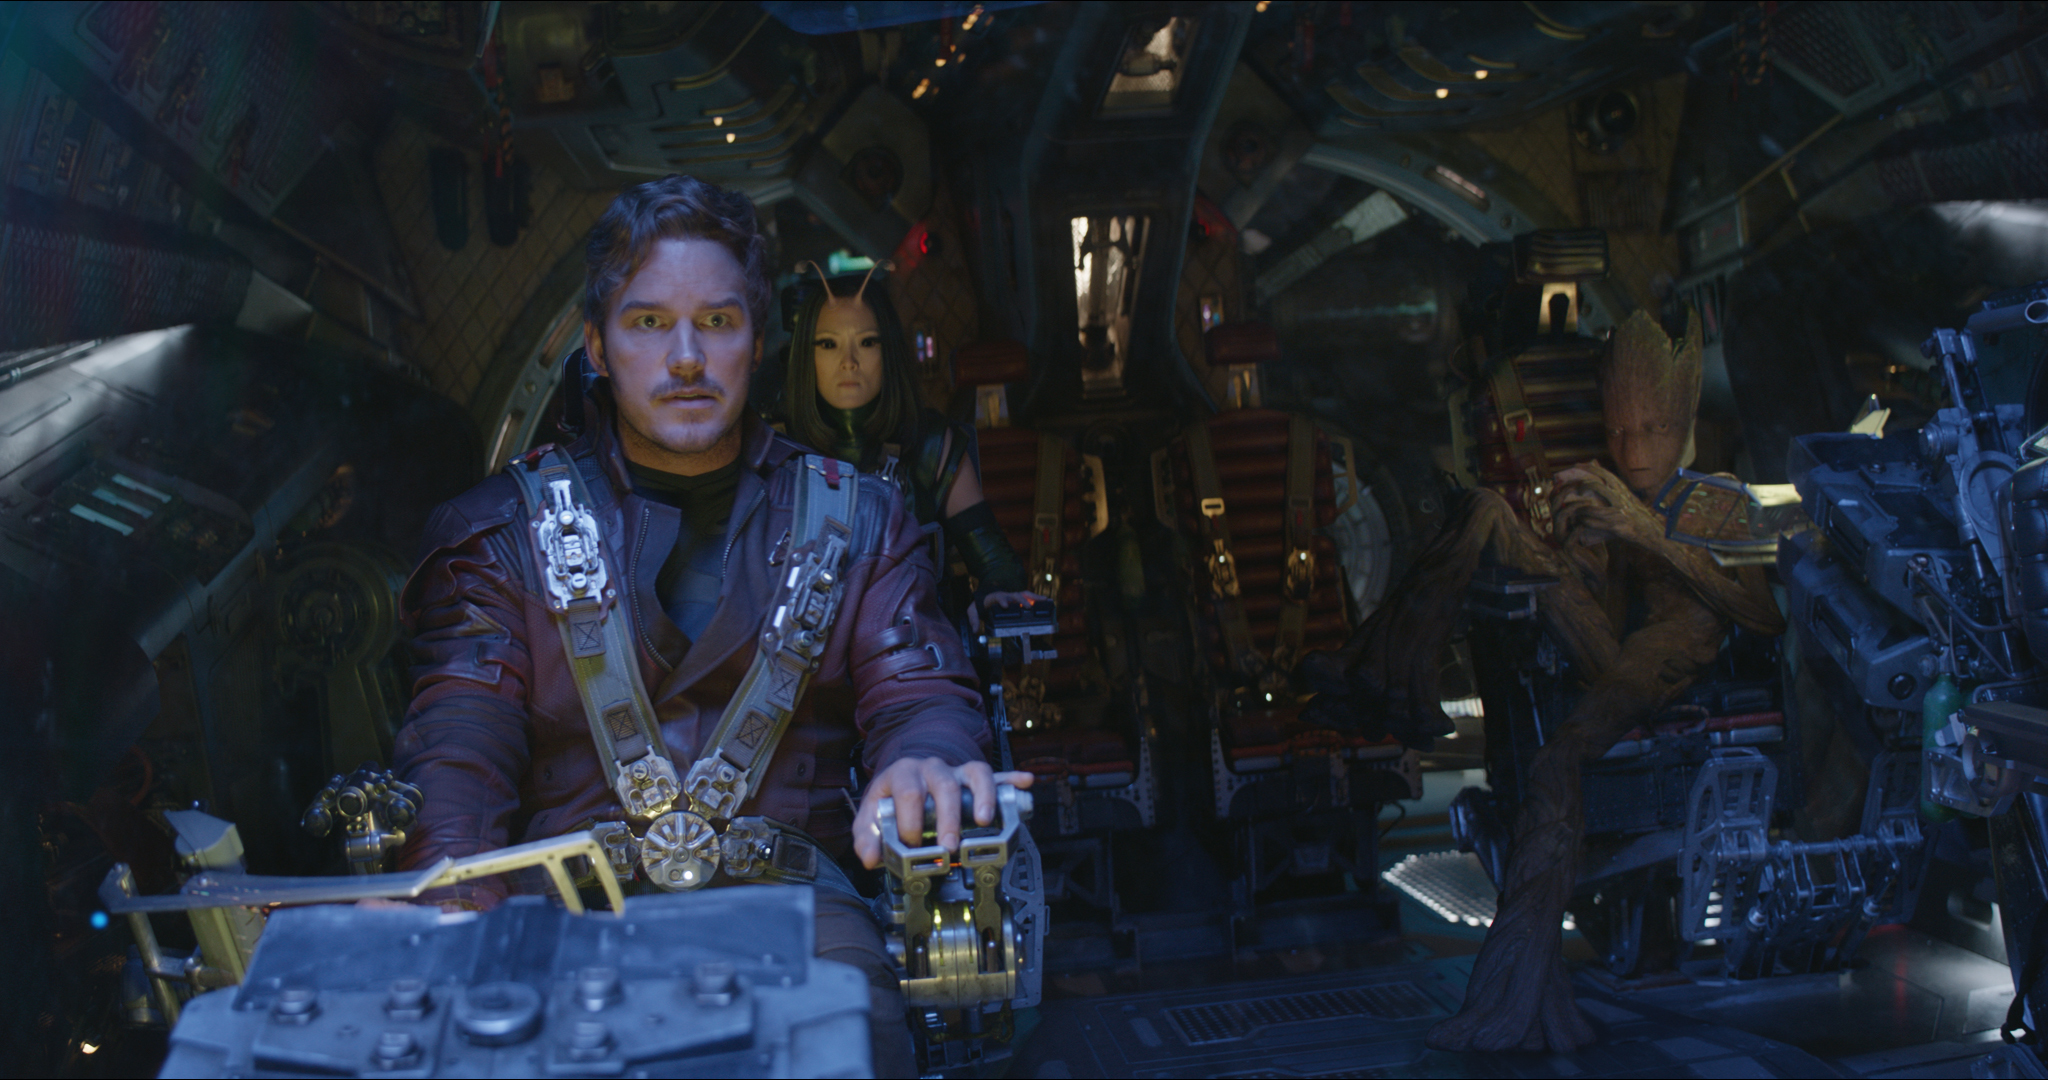 Vin Diesel, Chris Pratt, and Pom Klementieff in Avengers: Infinity War (2018)